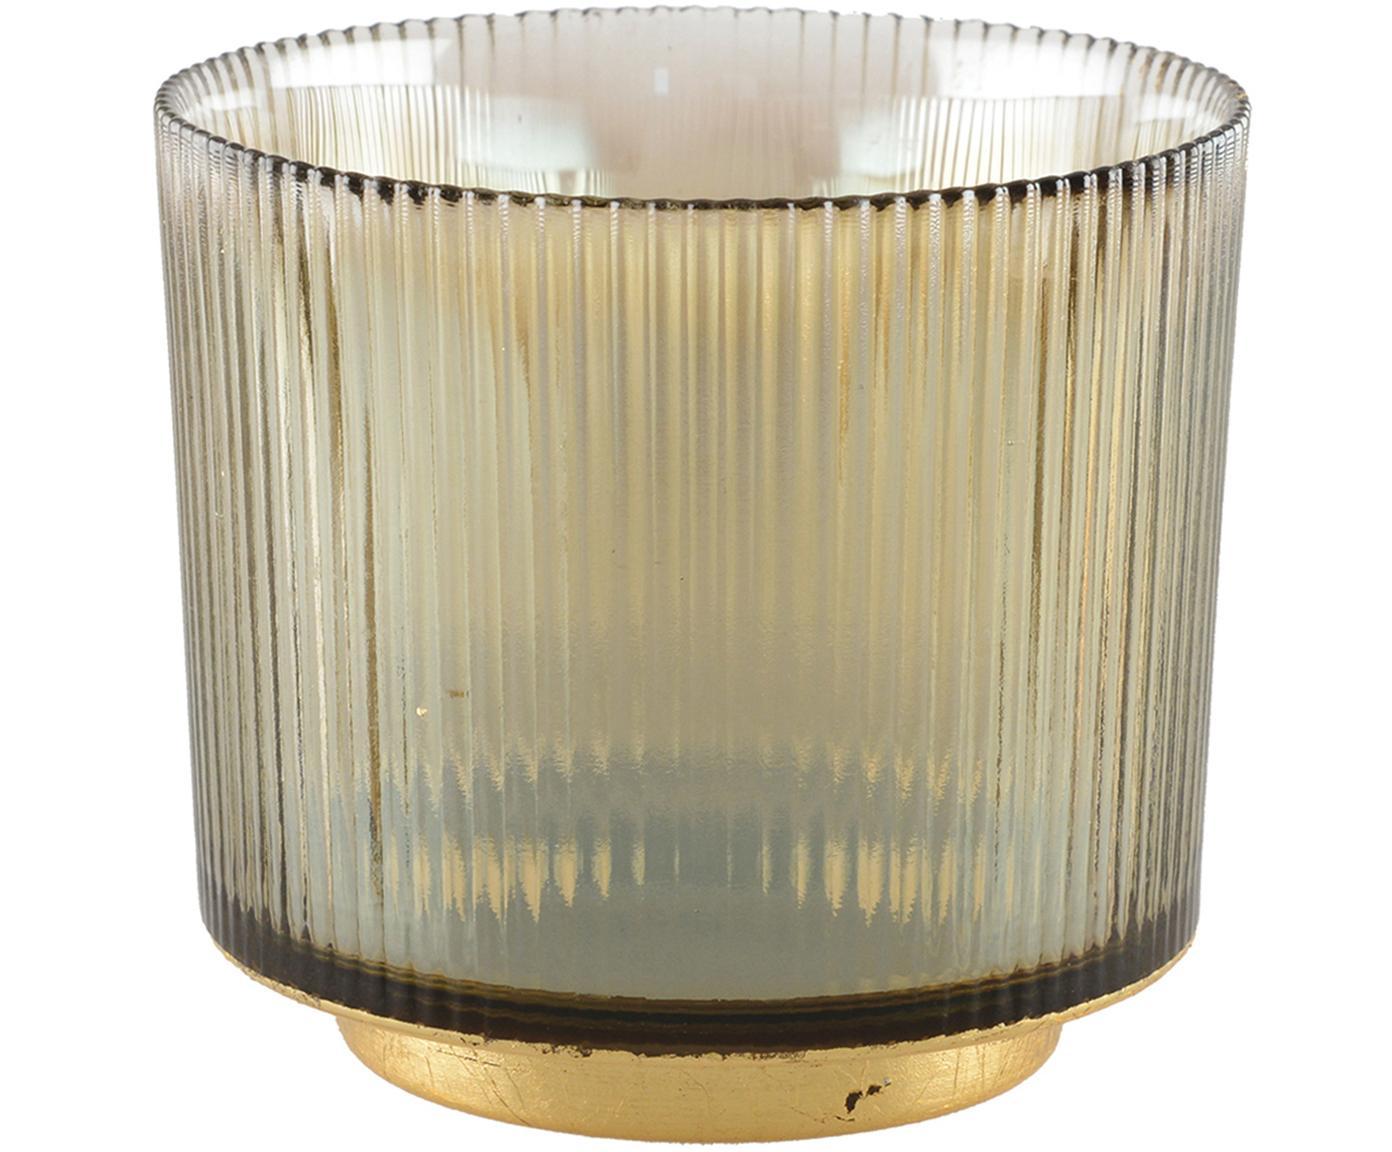 Portavelas Luster, Vidrio, metal, Marrón transparente, dorado, Ø 10 cm